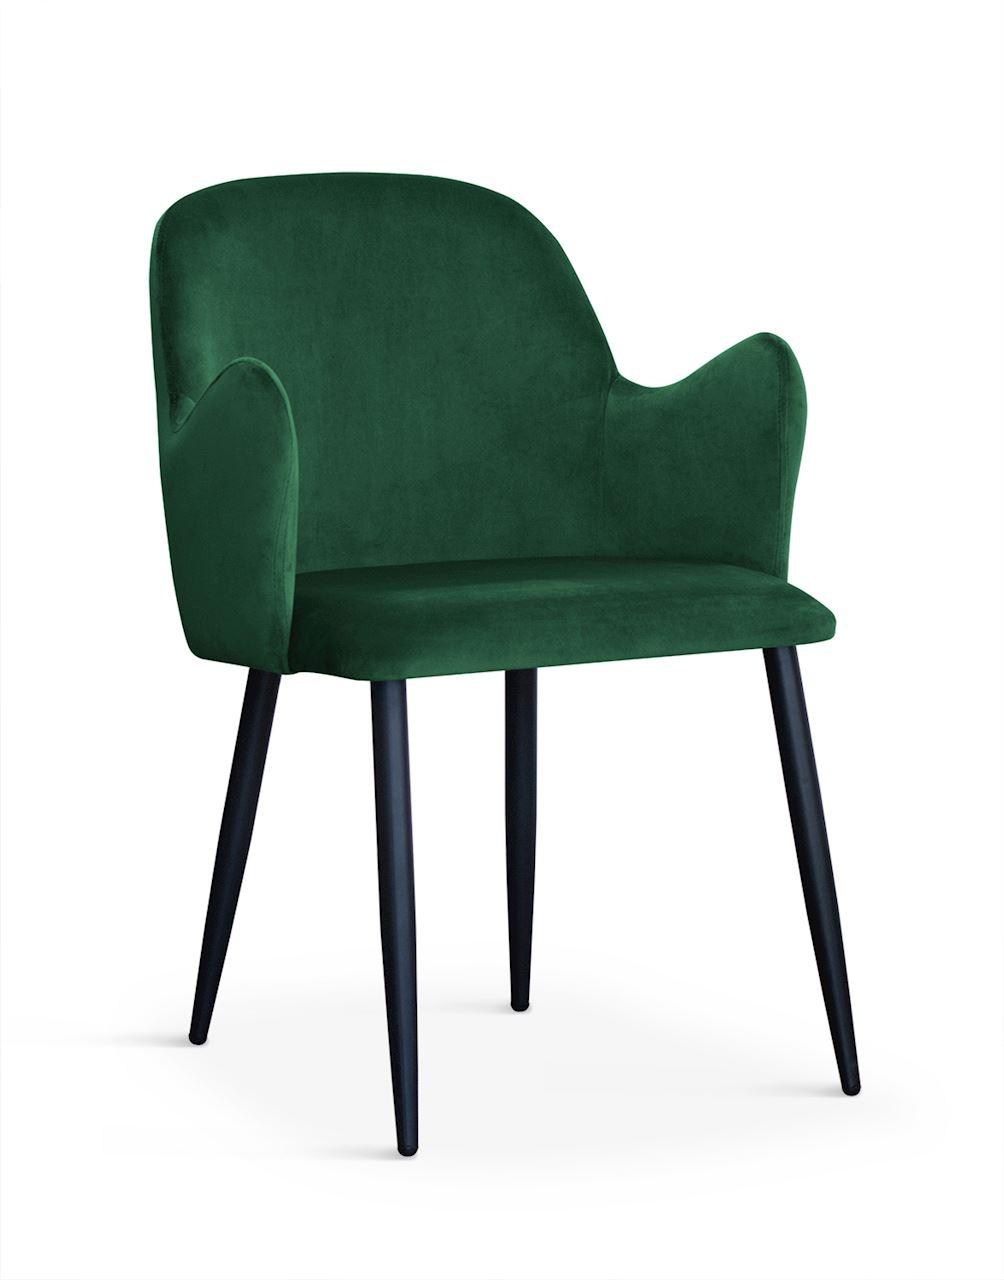 Scaun Tapitat Stofa Picioare Metalice Velvet Verde Negru